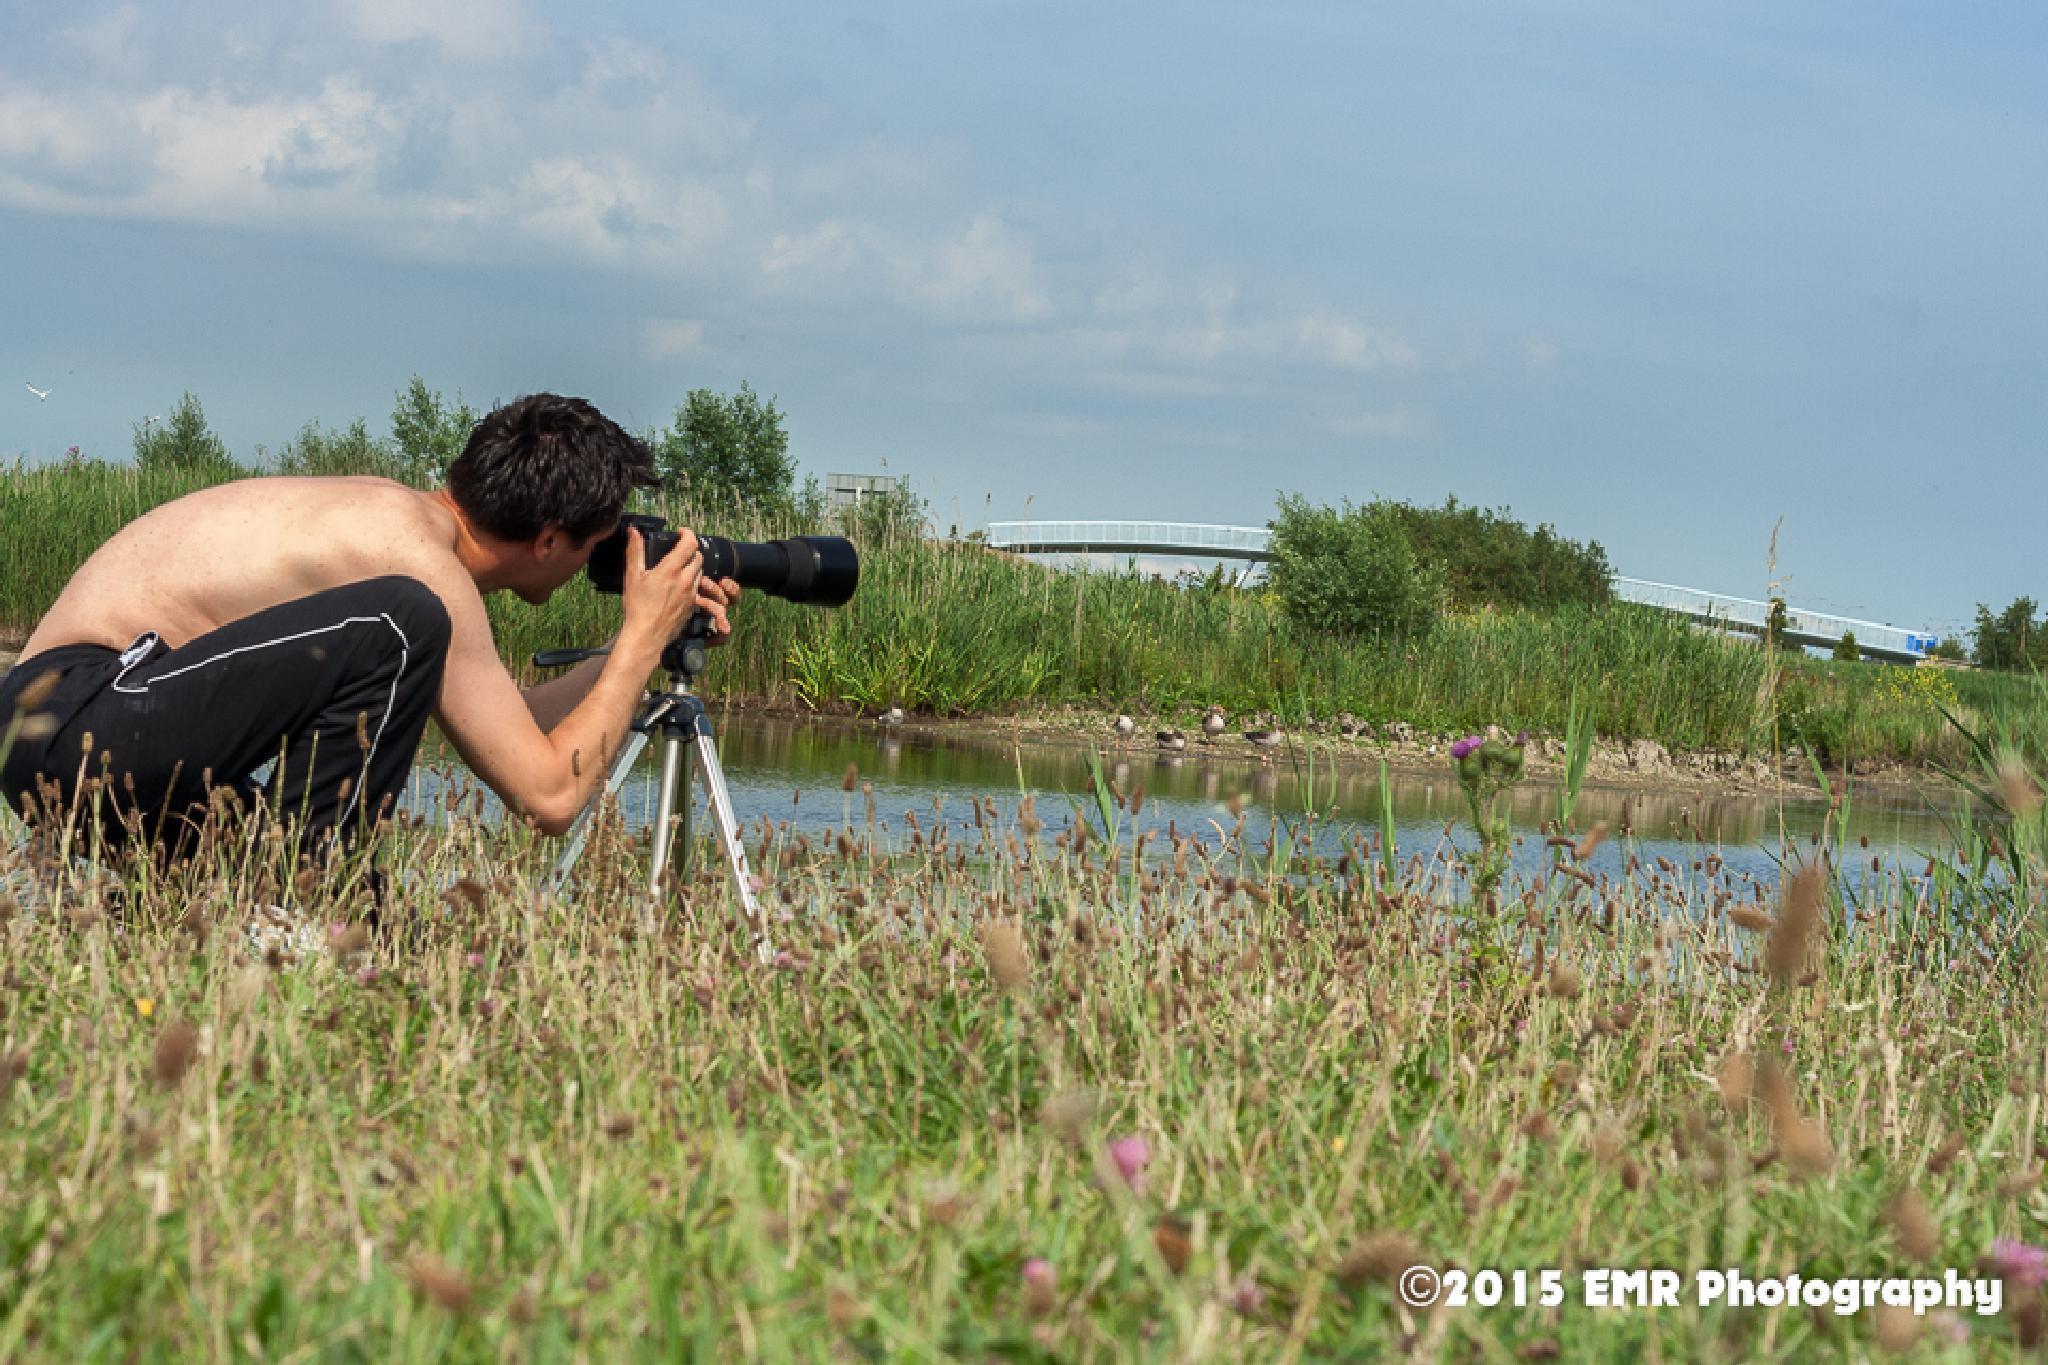 Me testing Sigma 135-400mm 1:4.5-5.6 apo dg by EMR Photography & Fotomodel Marijn